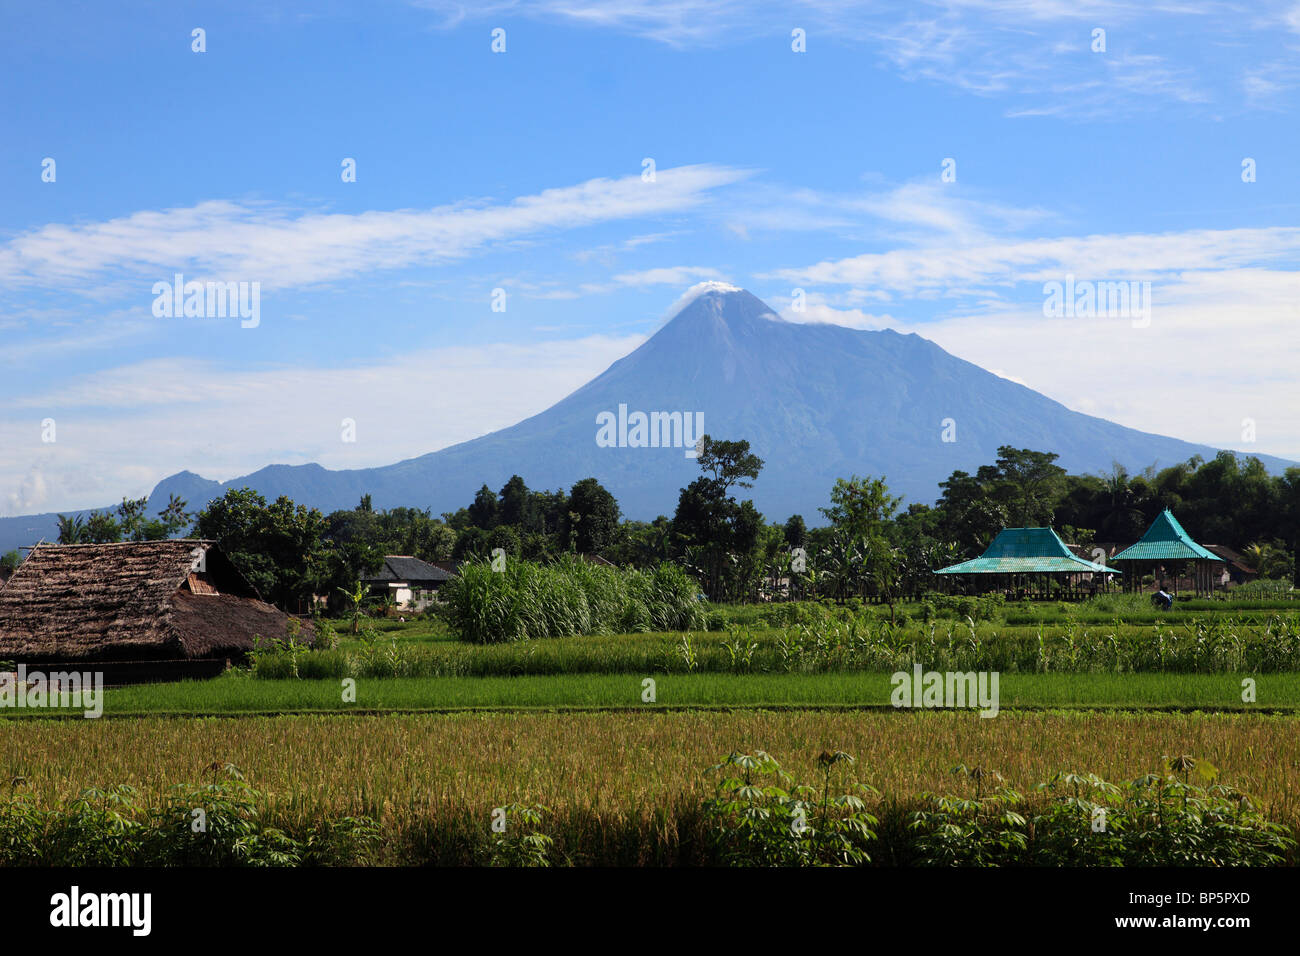 Indonesia, Java, Gunung Merapi volcano; agricultural fields; - Stock Image